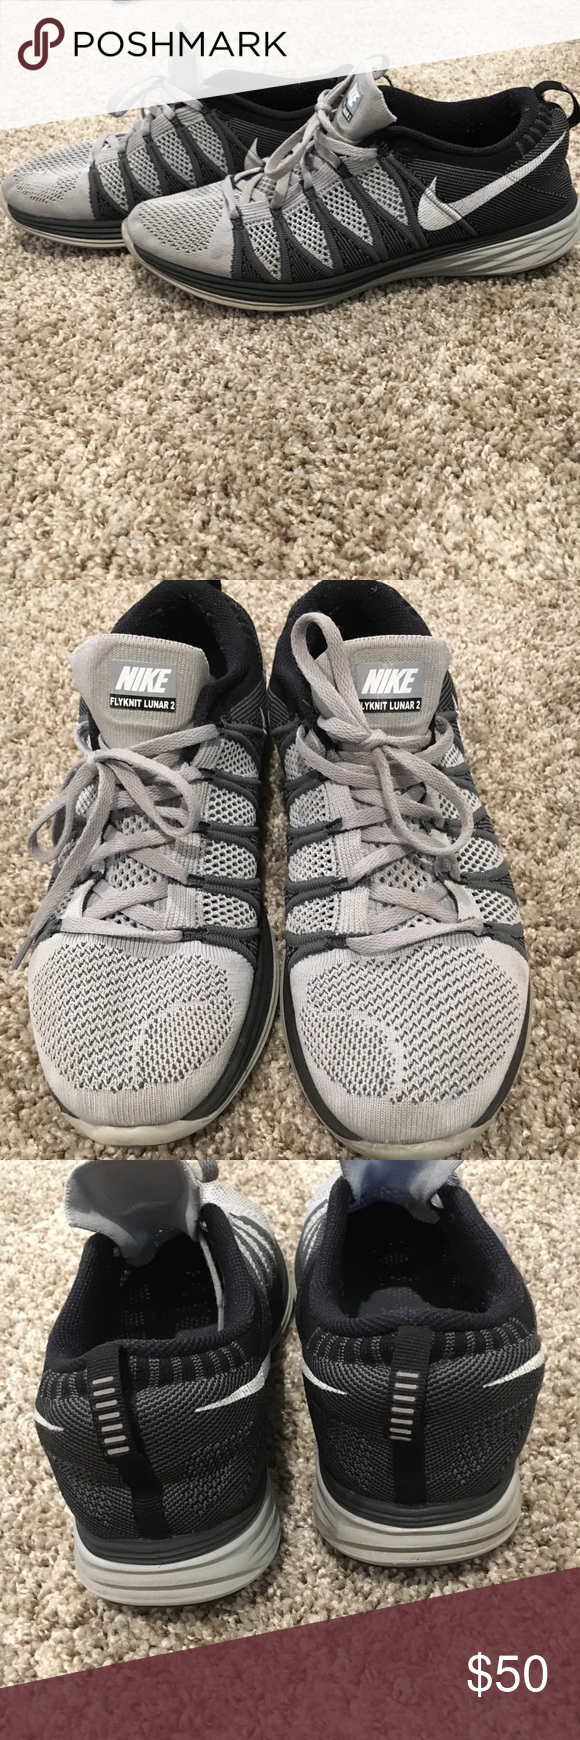 40d1051c2e02b Men s Size 9 Nike Flyknit Lunar 2 Grey Men s Nike Flyknit Lunar 2 Size 9  Light